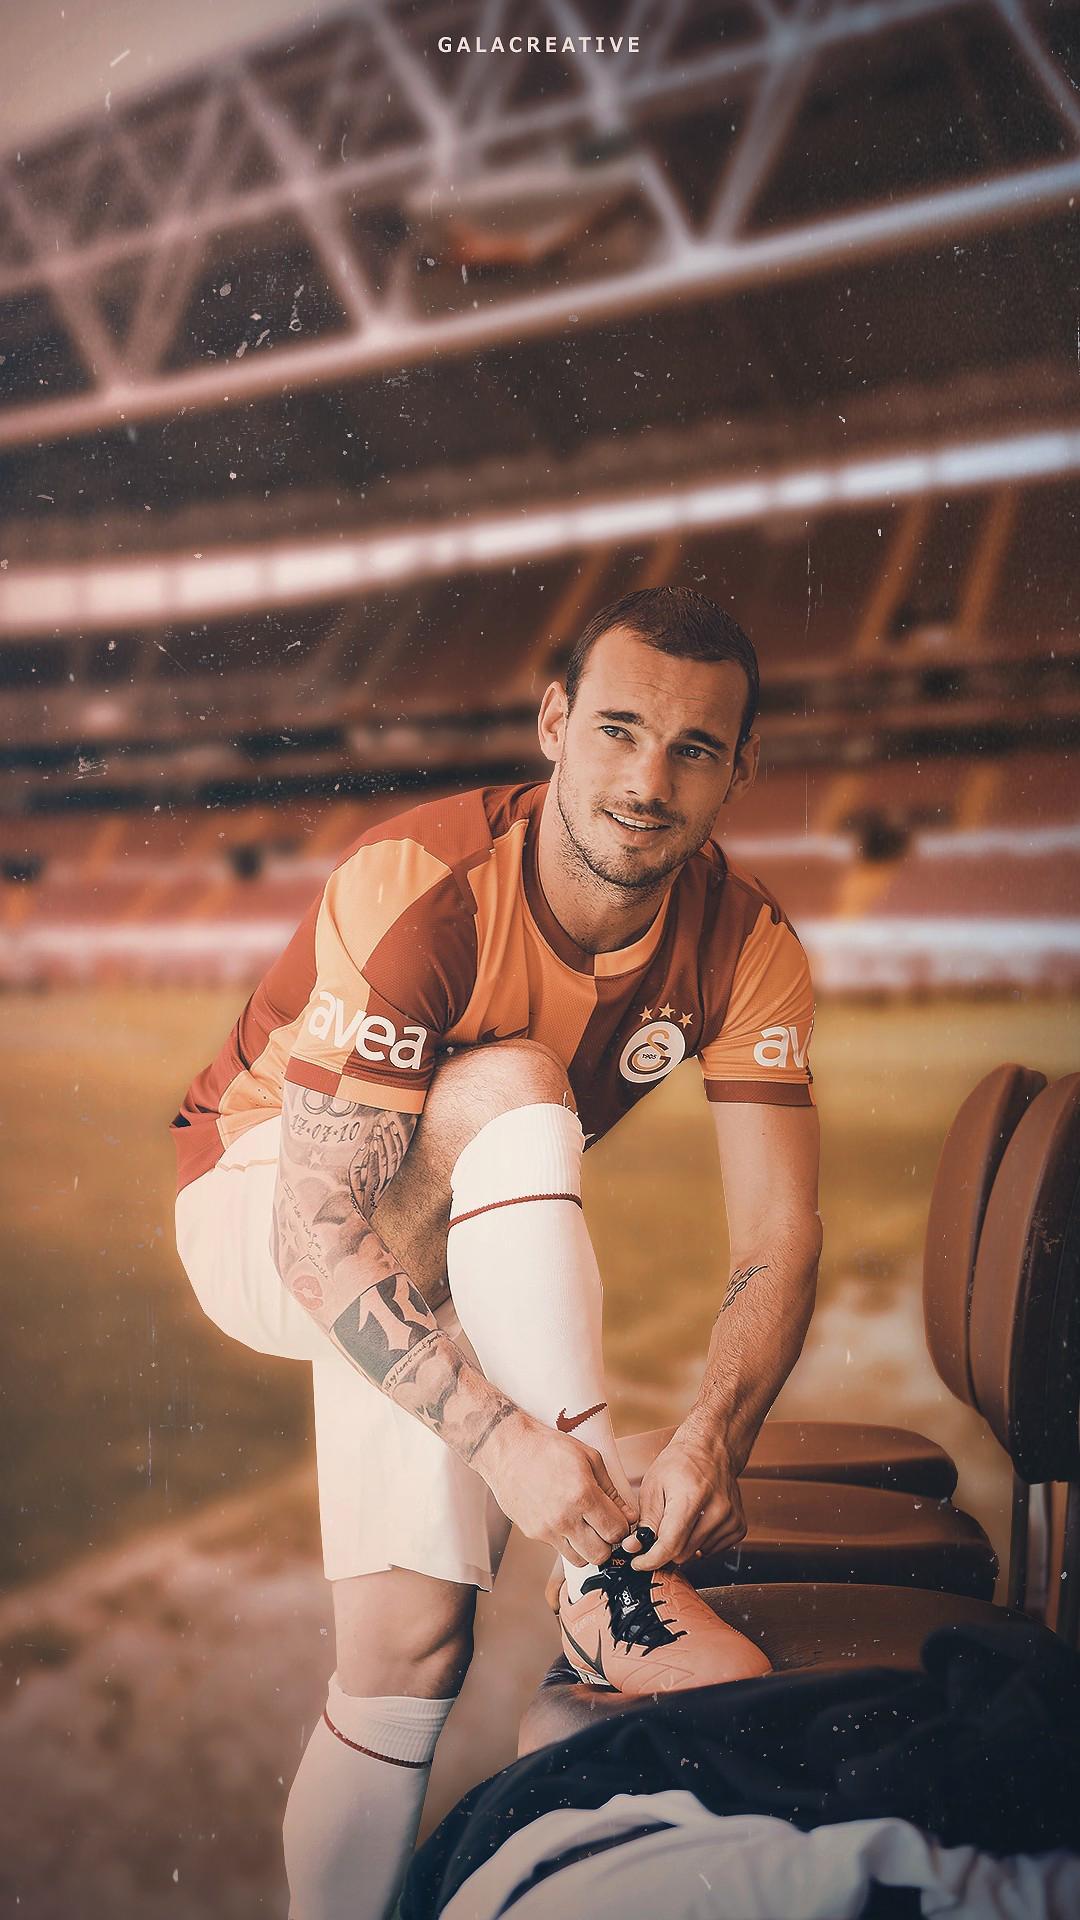 Wesley Sneijder Galatasaray Duvar Kağıdı HD #wallpaperbackgrounds